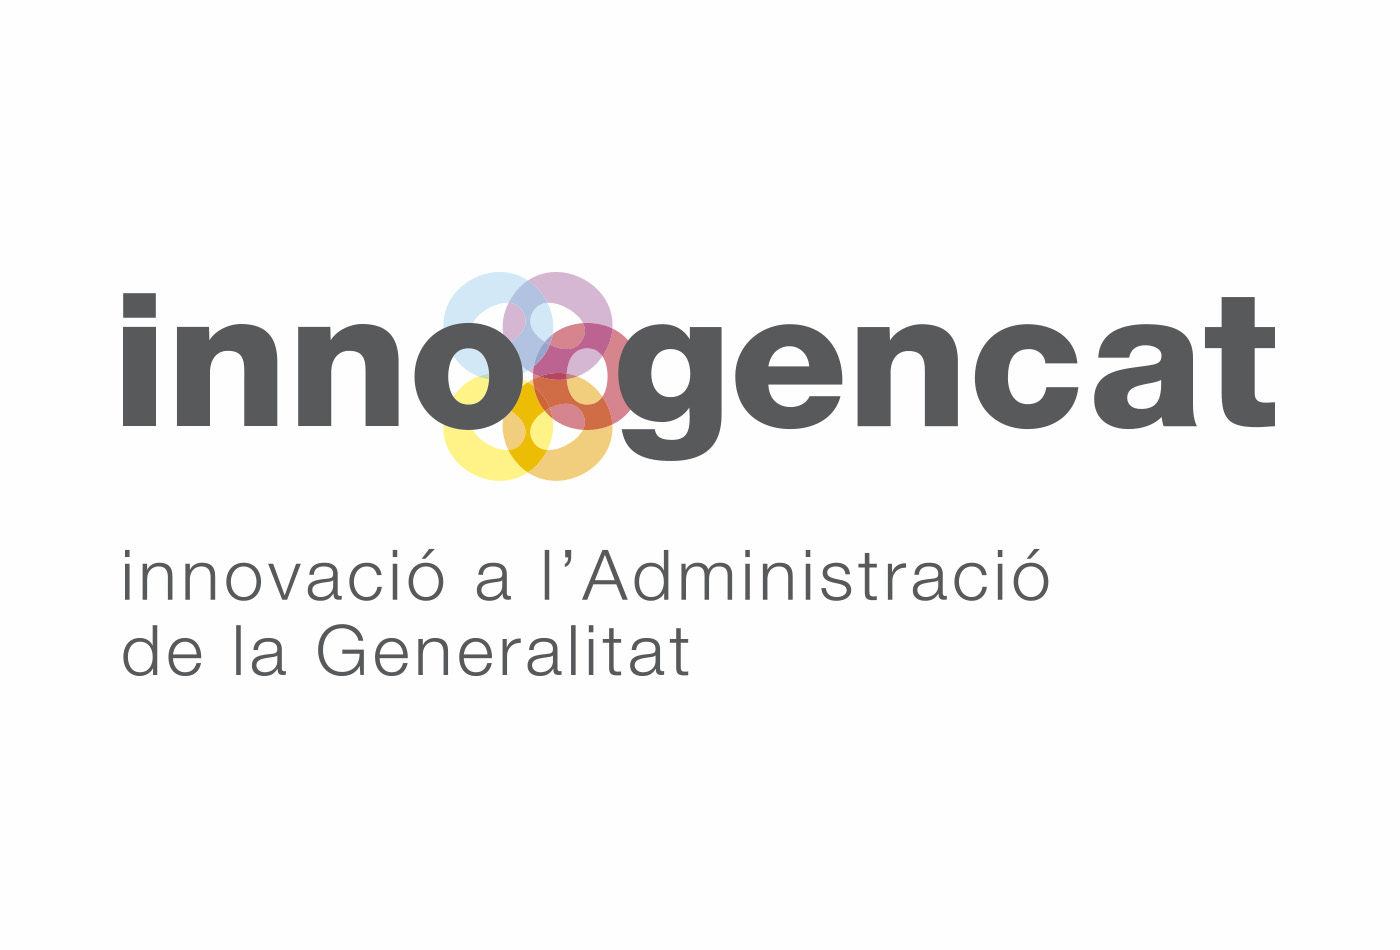 logo-innogencat-generalitat-branding